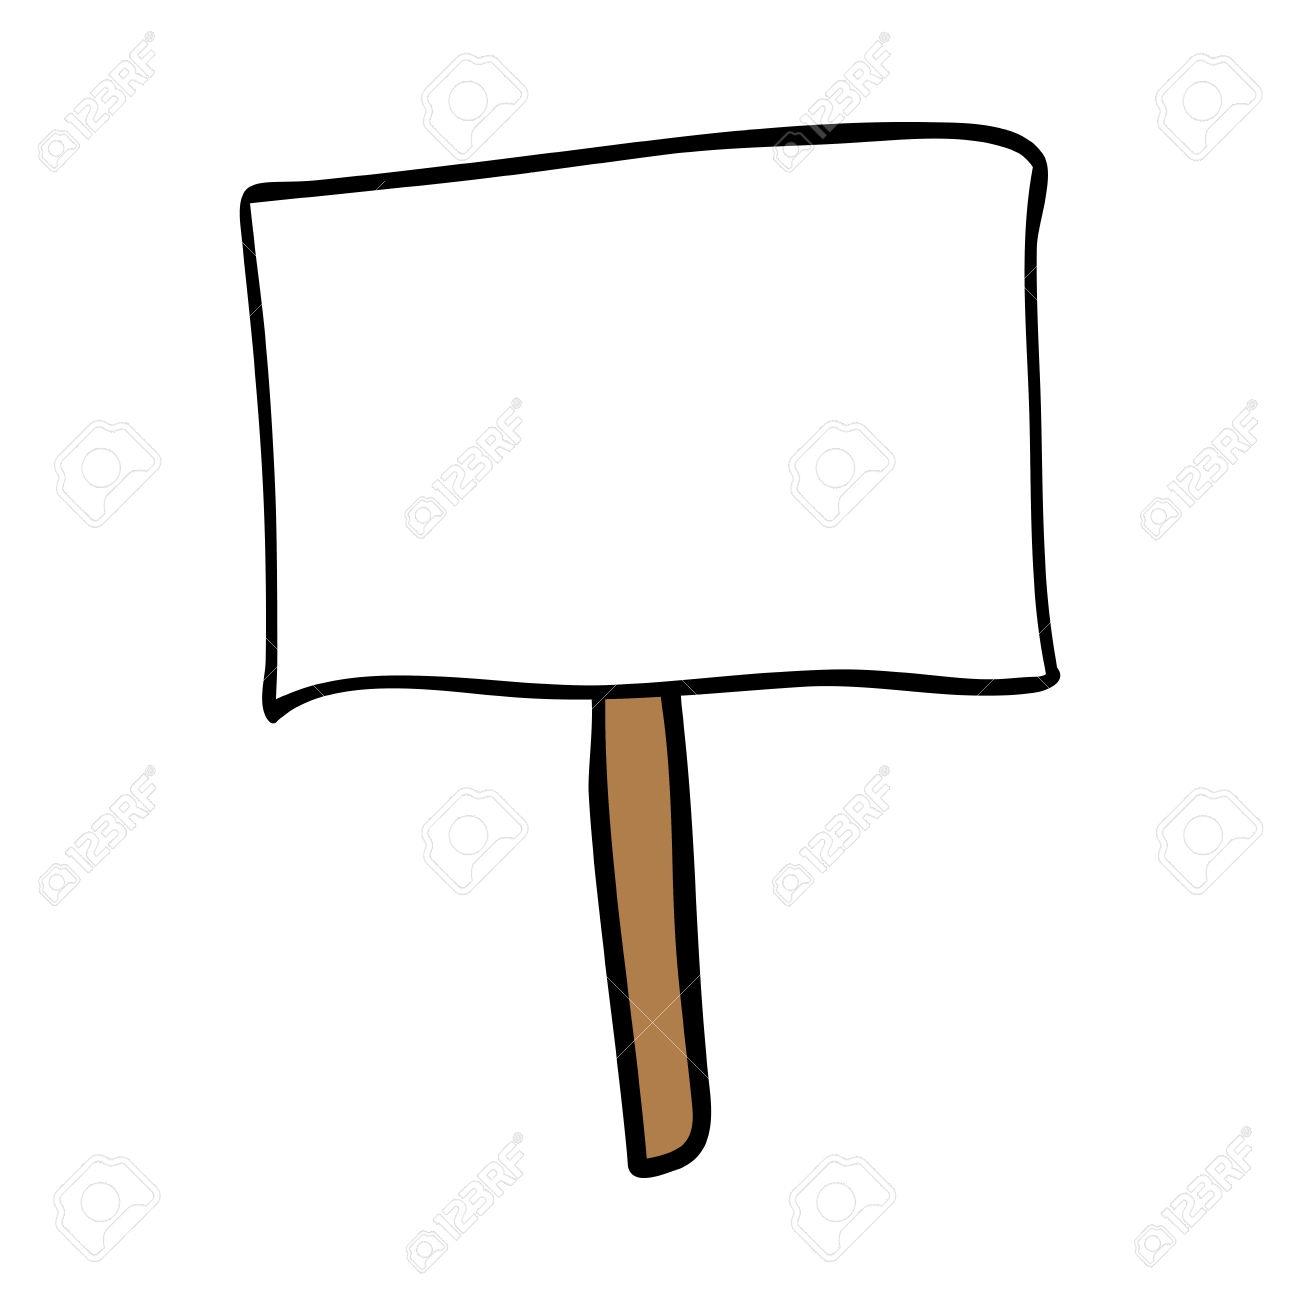 Blank bar sign clipart jpg freeuse stock Protest Clipart   Free download best Protest Clipart on ClipArtMag.com jpg freeuse stock